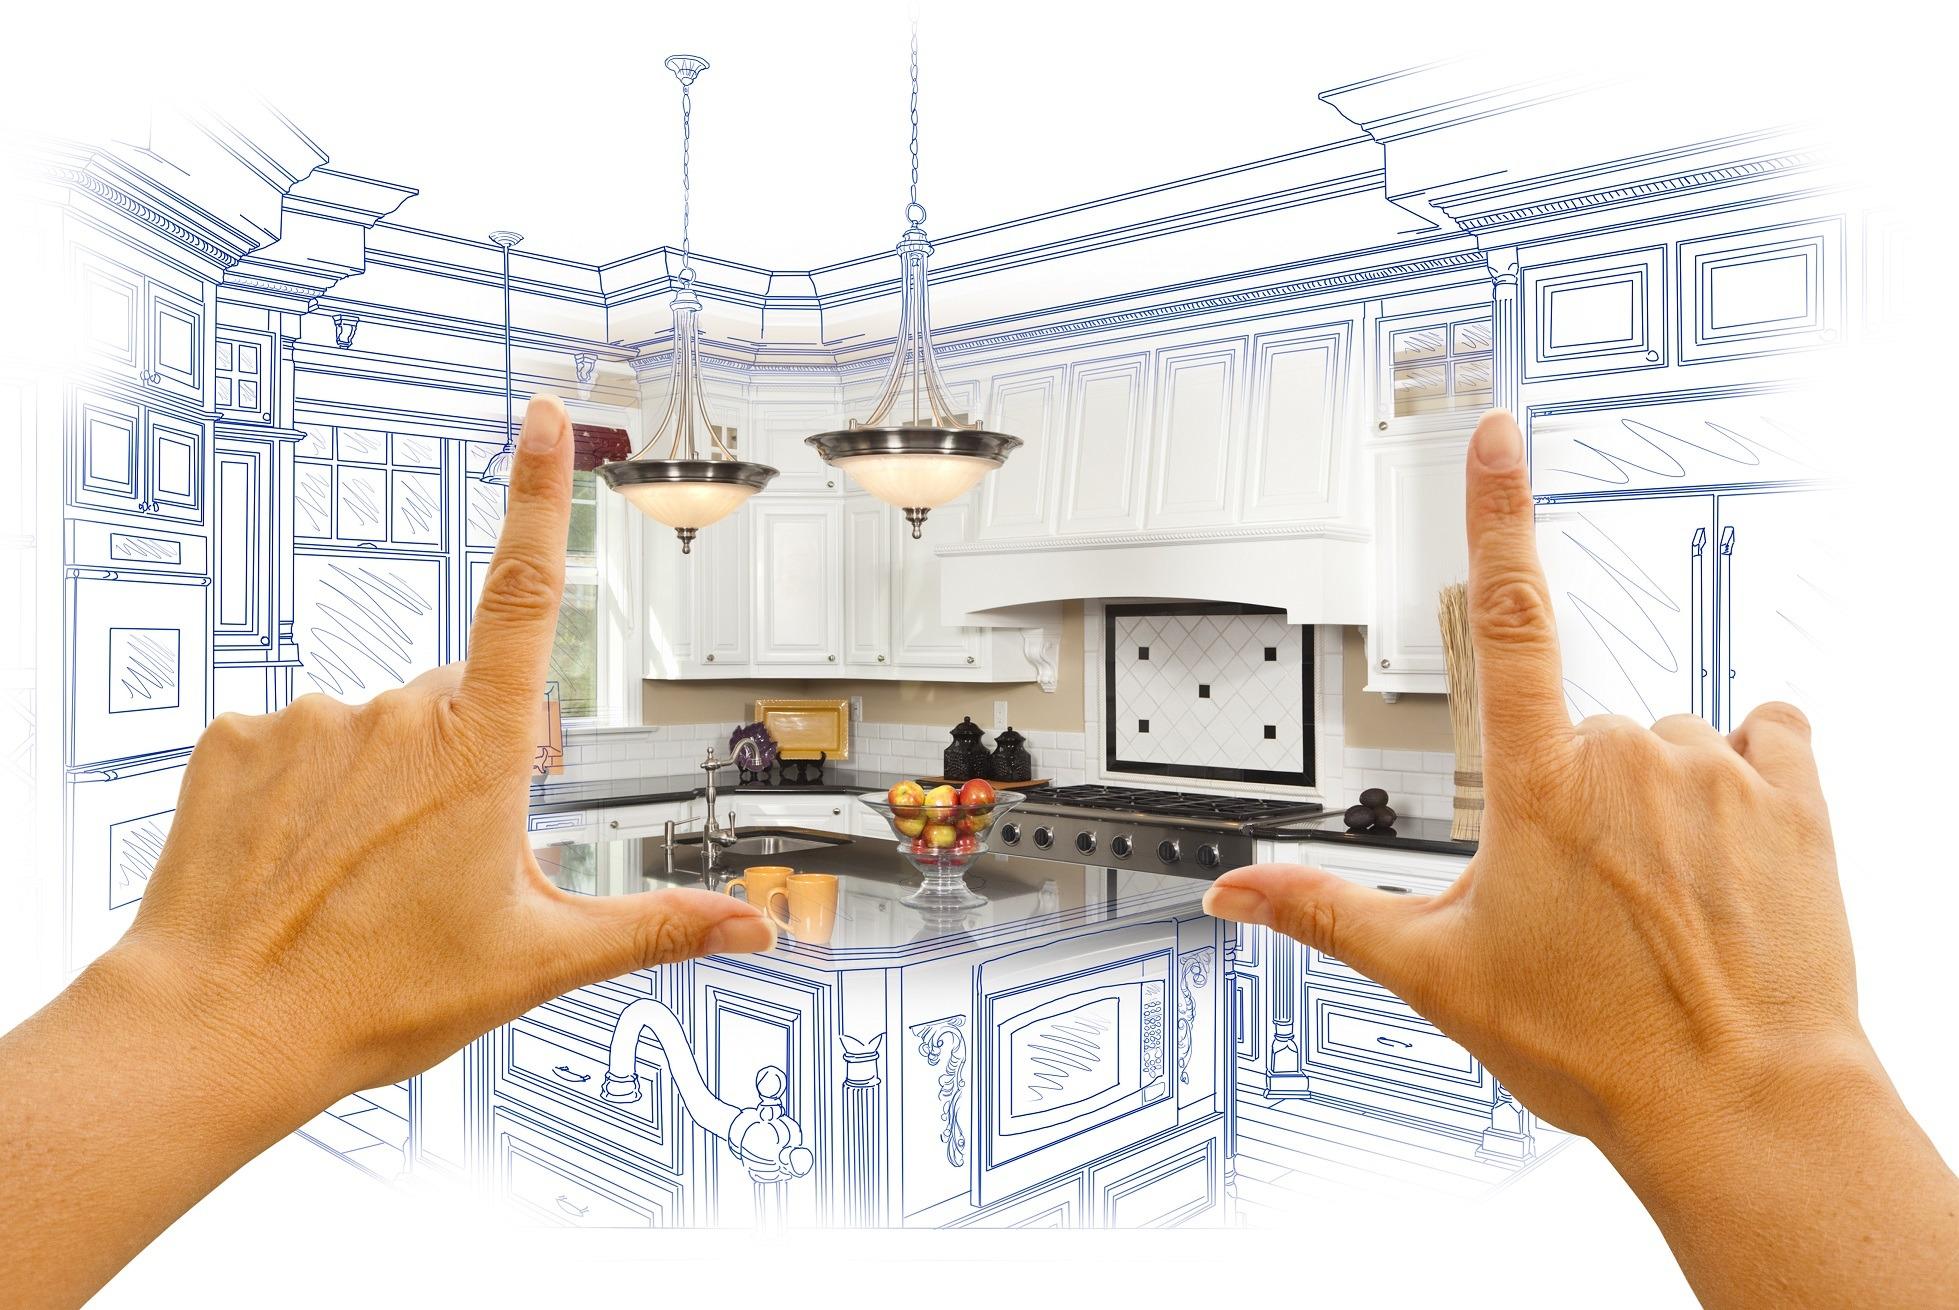 Hands showing off kitchen design.